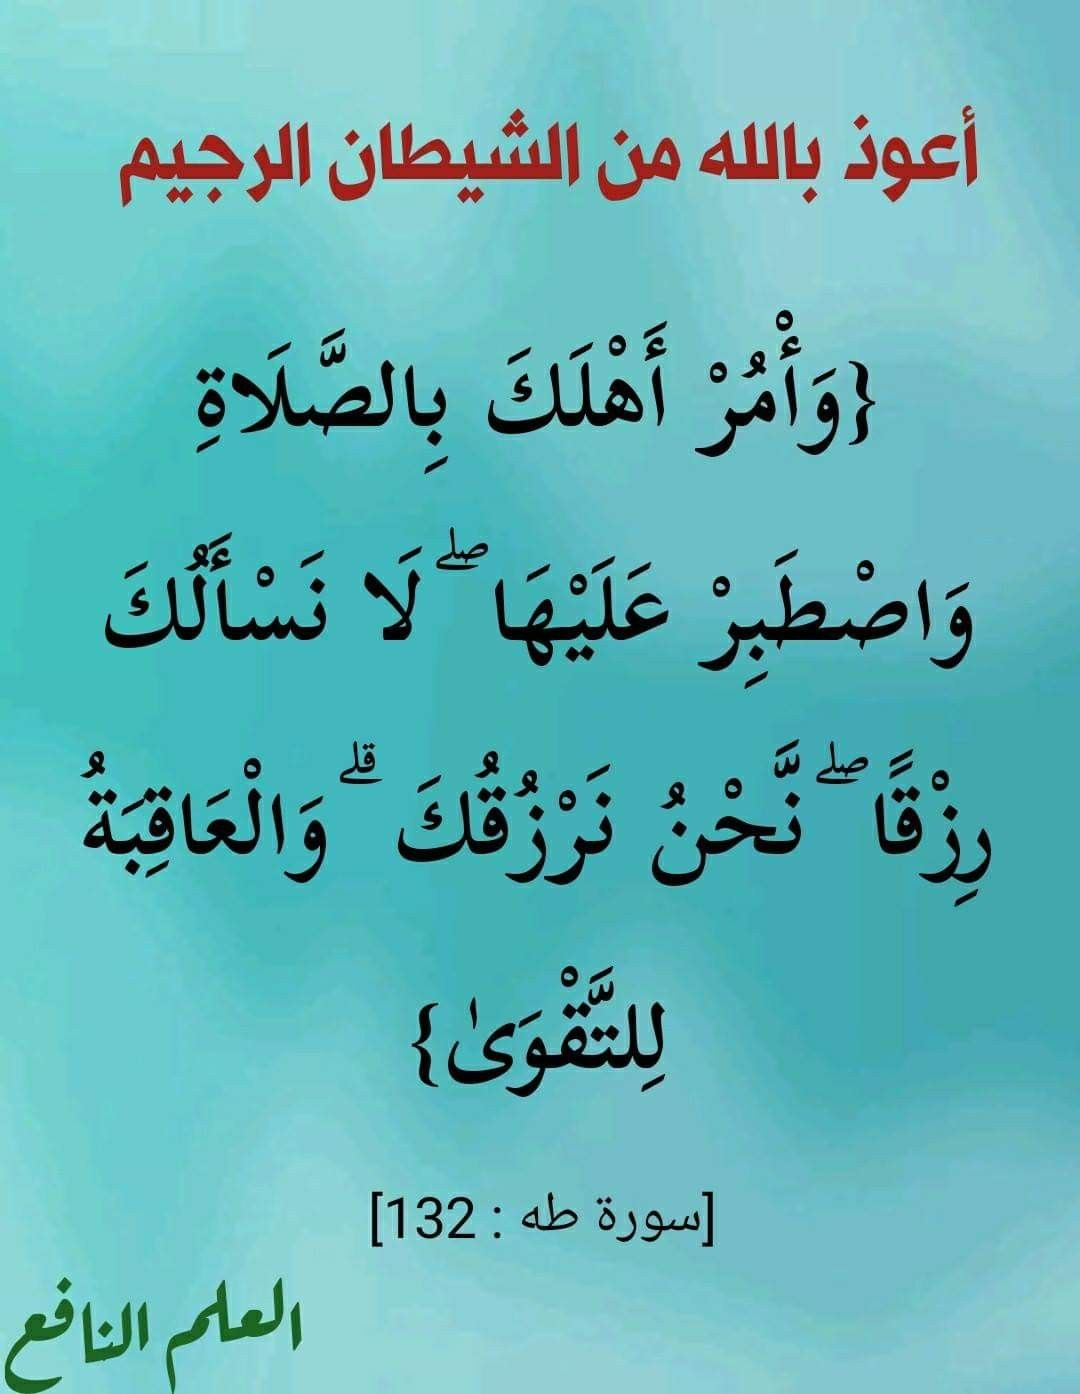 Pin By The Noble Quran On I Love Allah Quran Islam The Prophet Miracles Hadith Heaven Prophets Faith Prayer Dua حكم وعبر احاديث الله اسلام قرآن دعاء Quran Wisdom Invocation